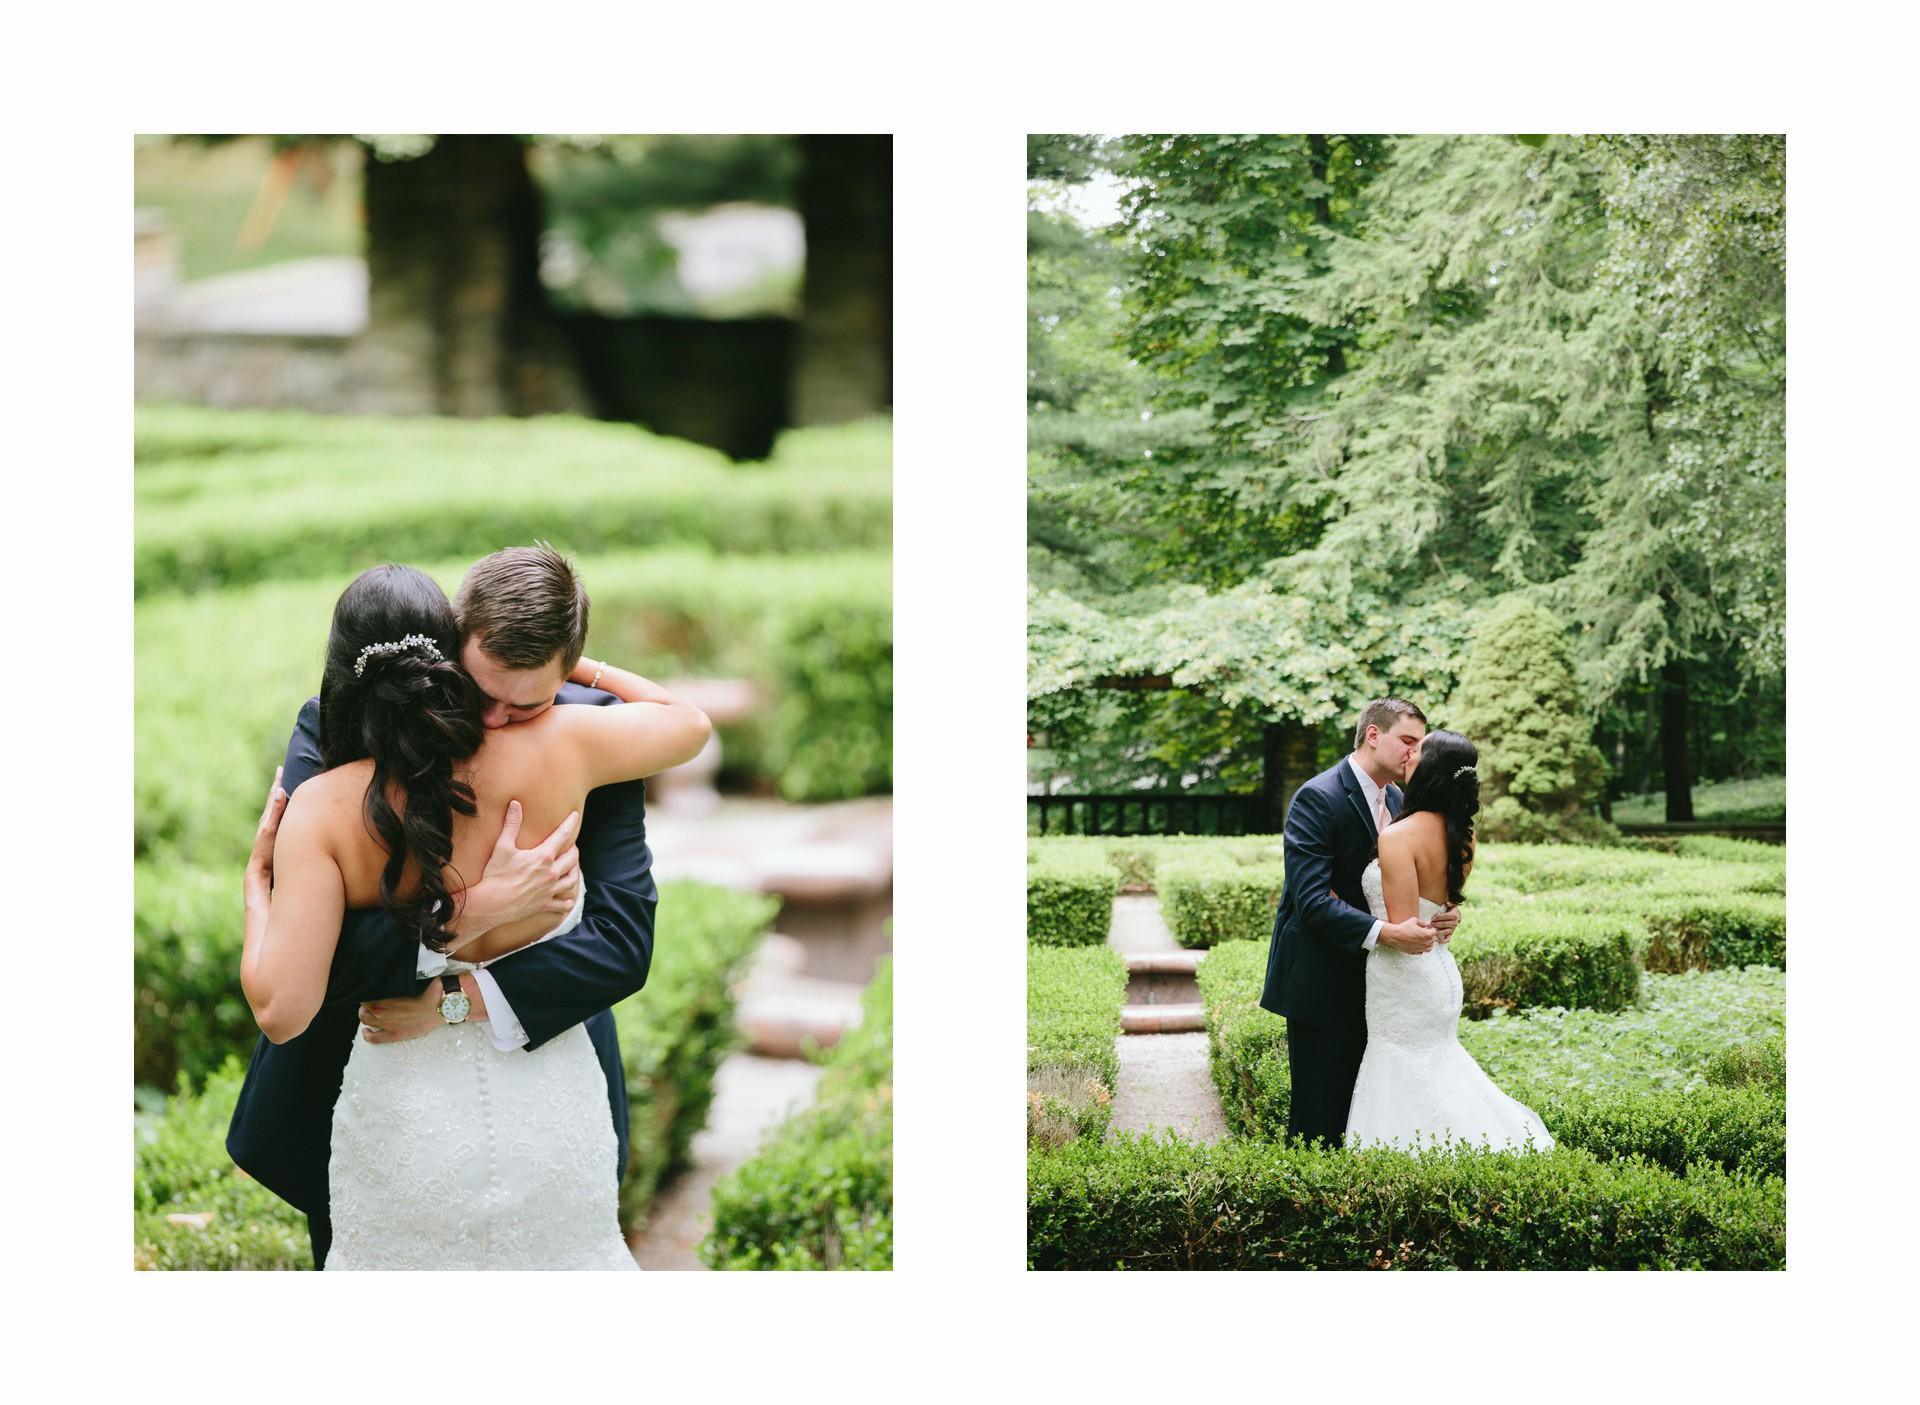 Bolton House Wedding Photographer in Beachwood 28.jpg